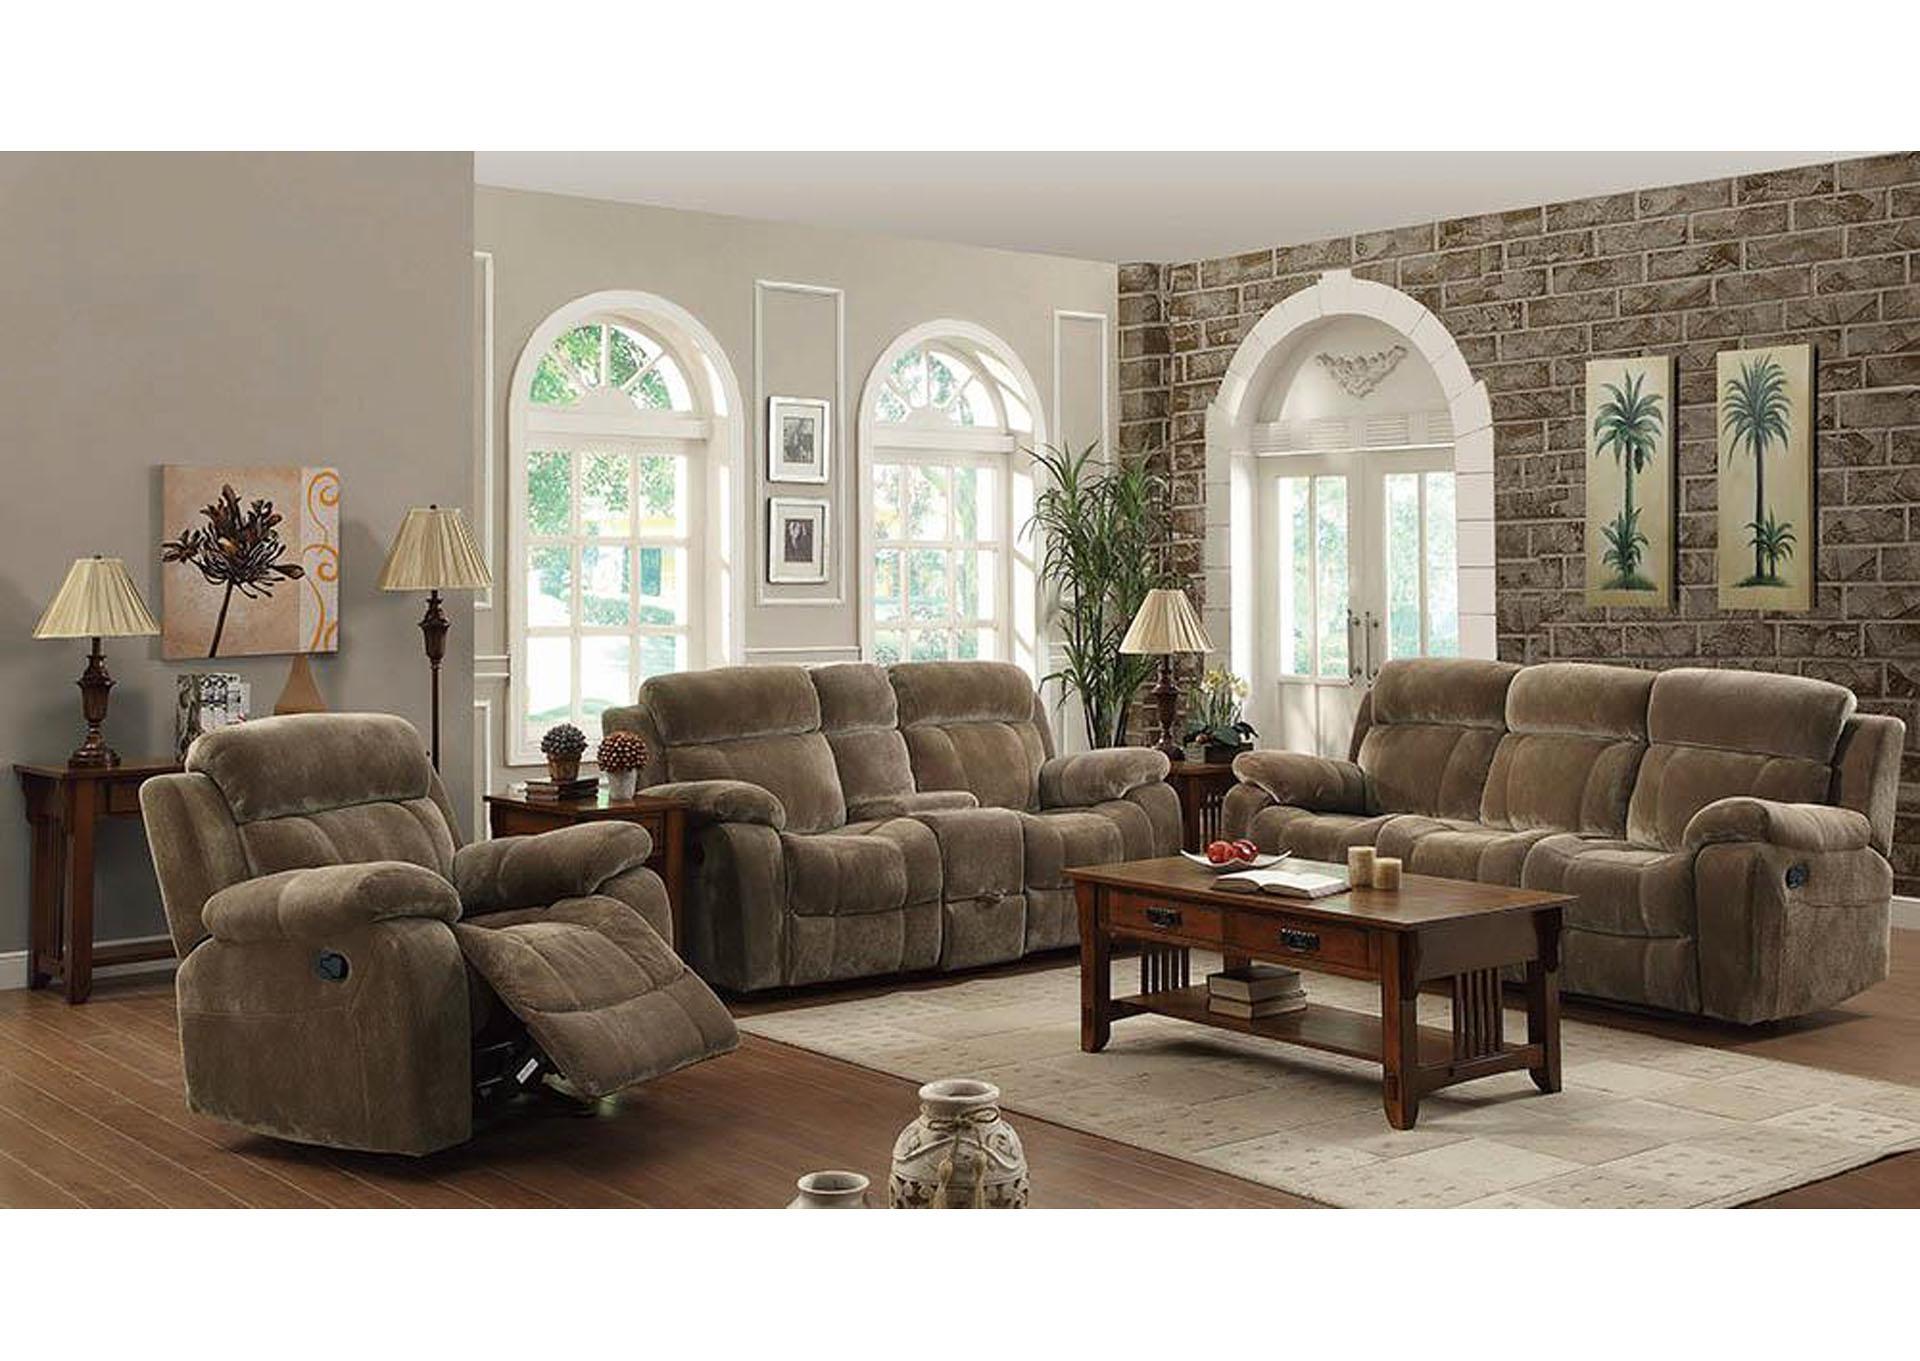 dream decor furniture springfield ma myleene brown